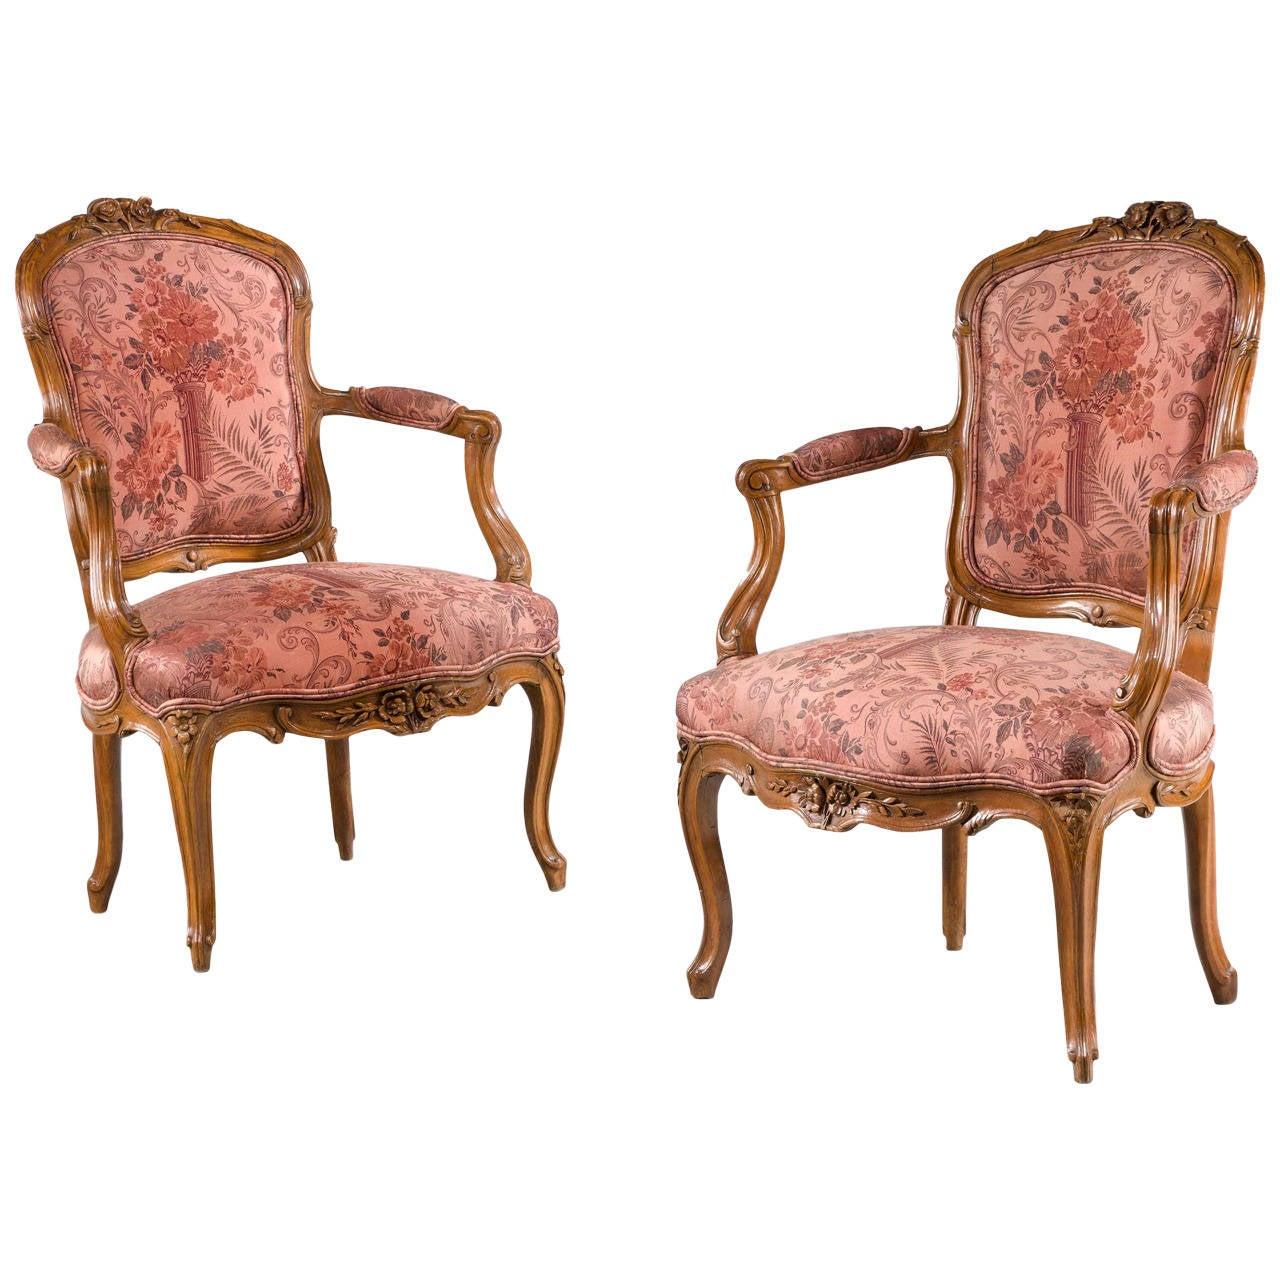 Pair of Louis XV Period Fauteuils